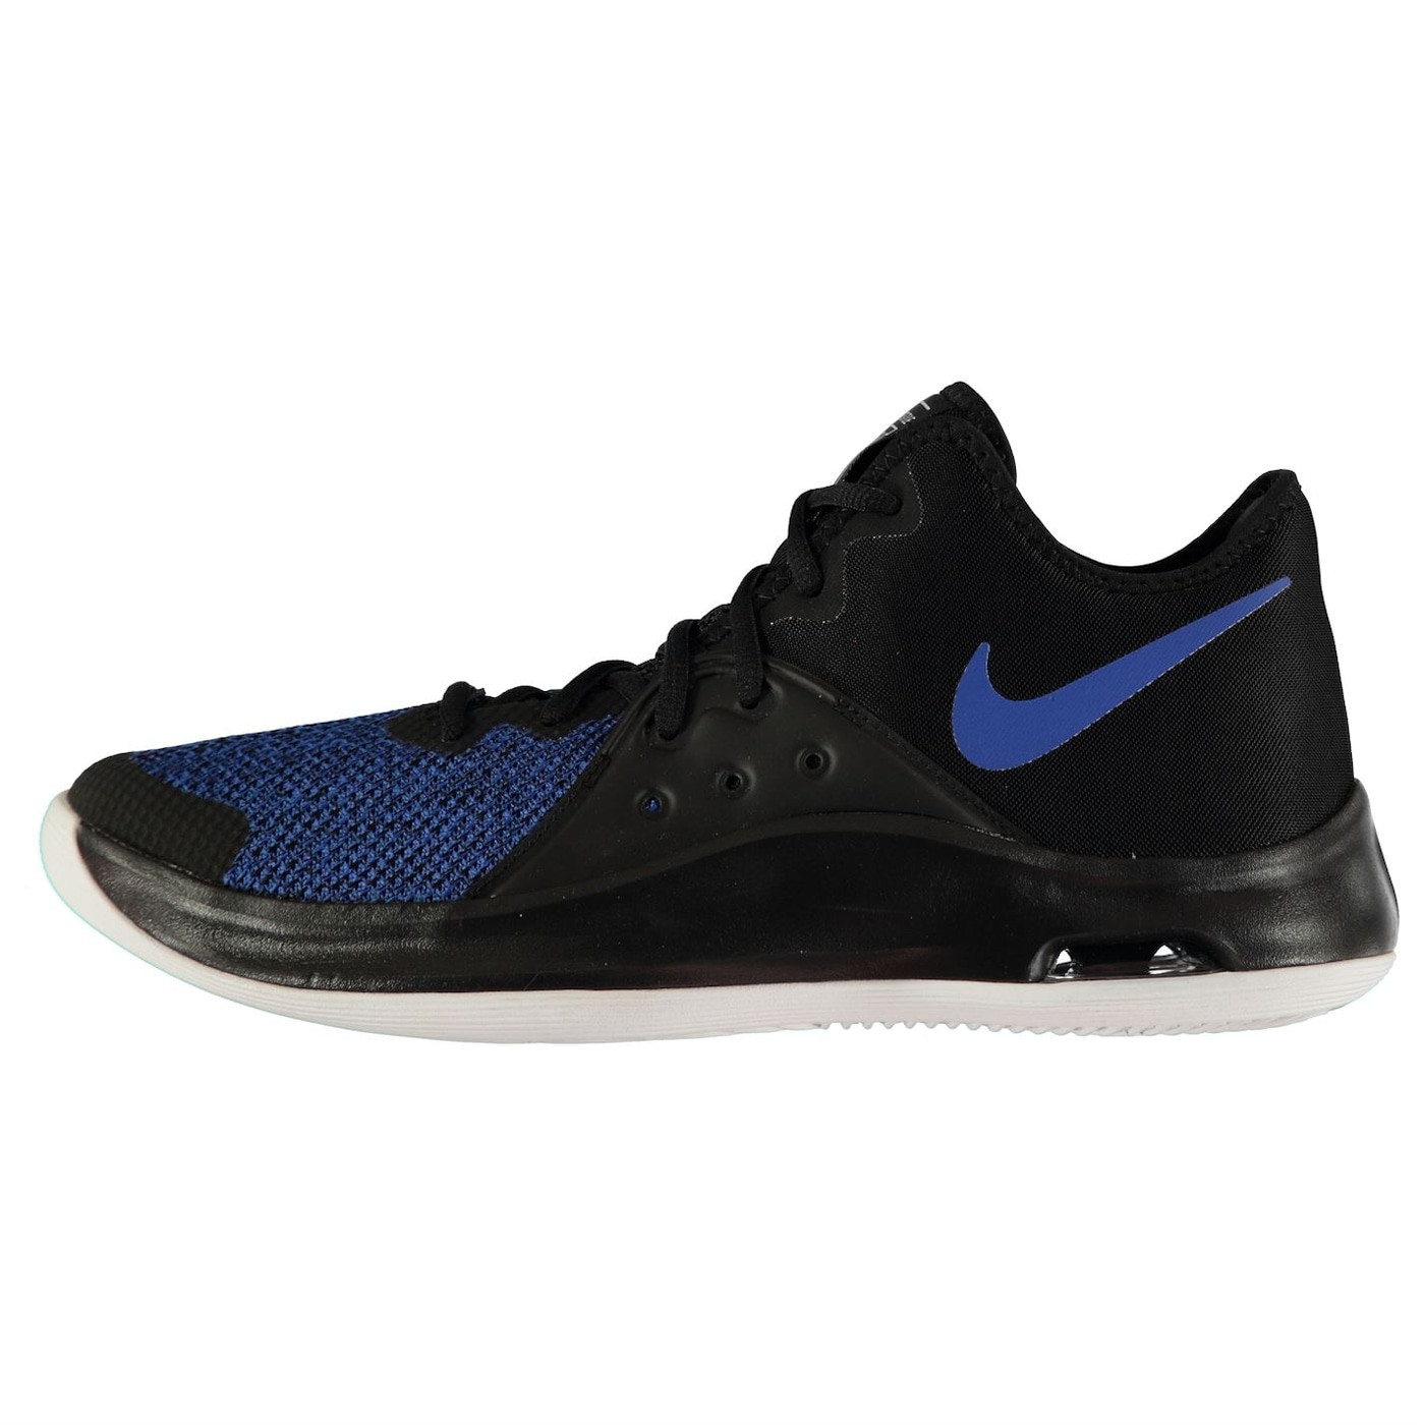 basketbalové boty boty Nike Air Versitile 3 pánské Baskteball